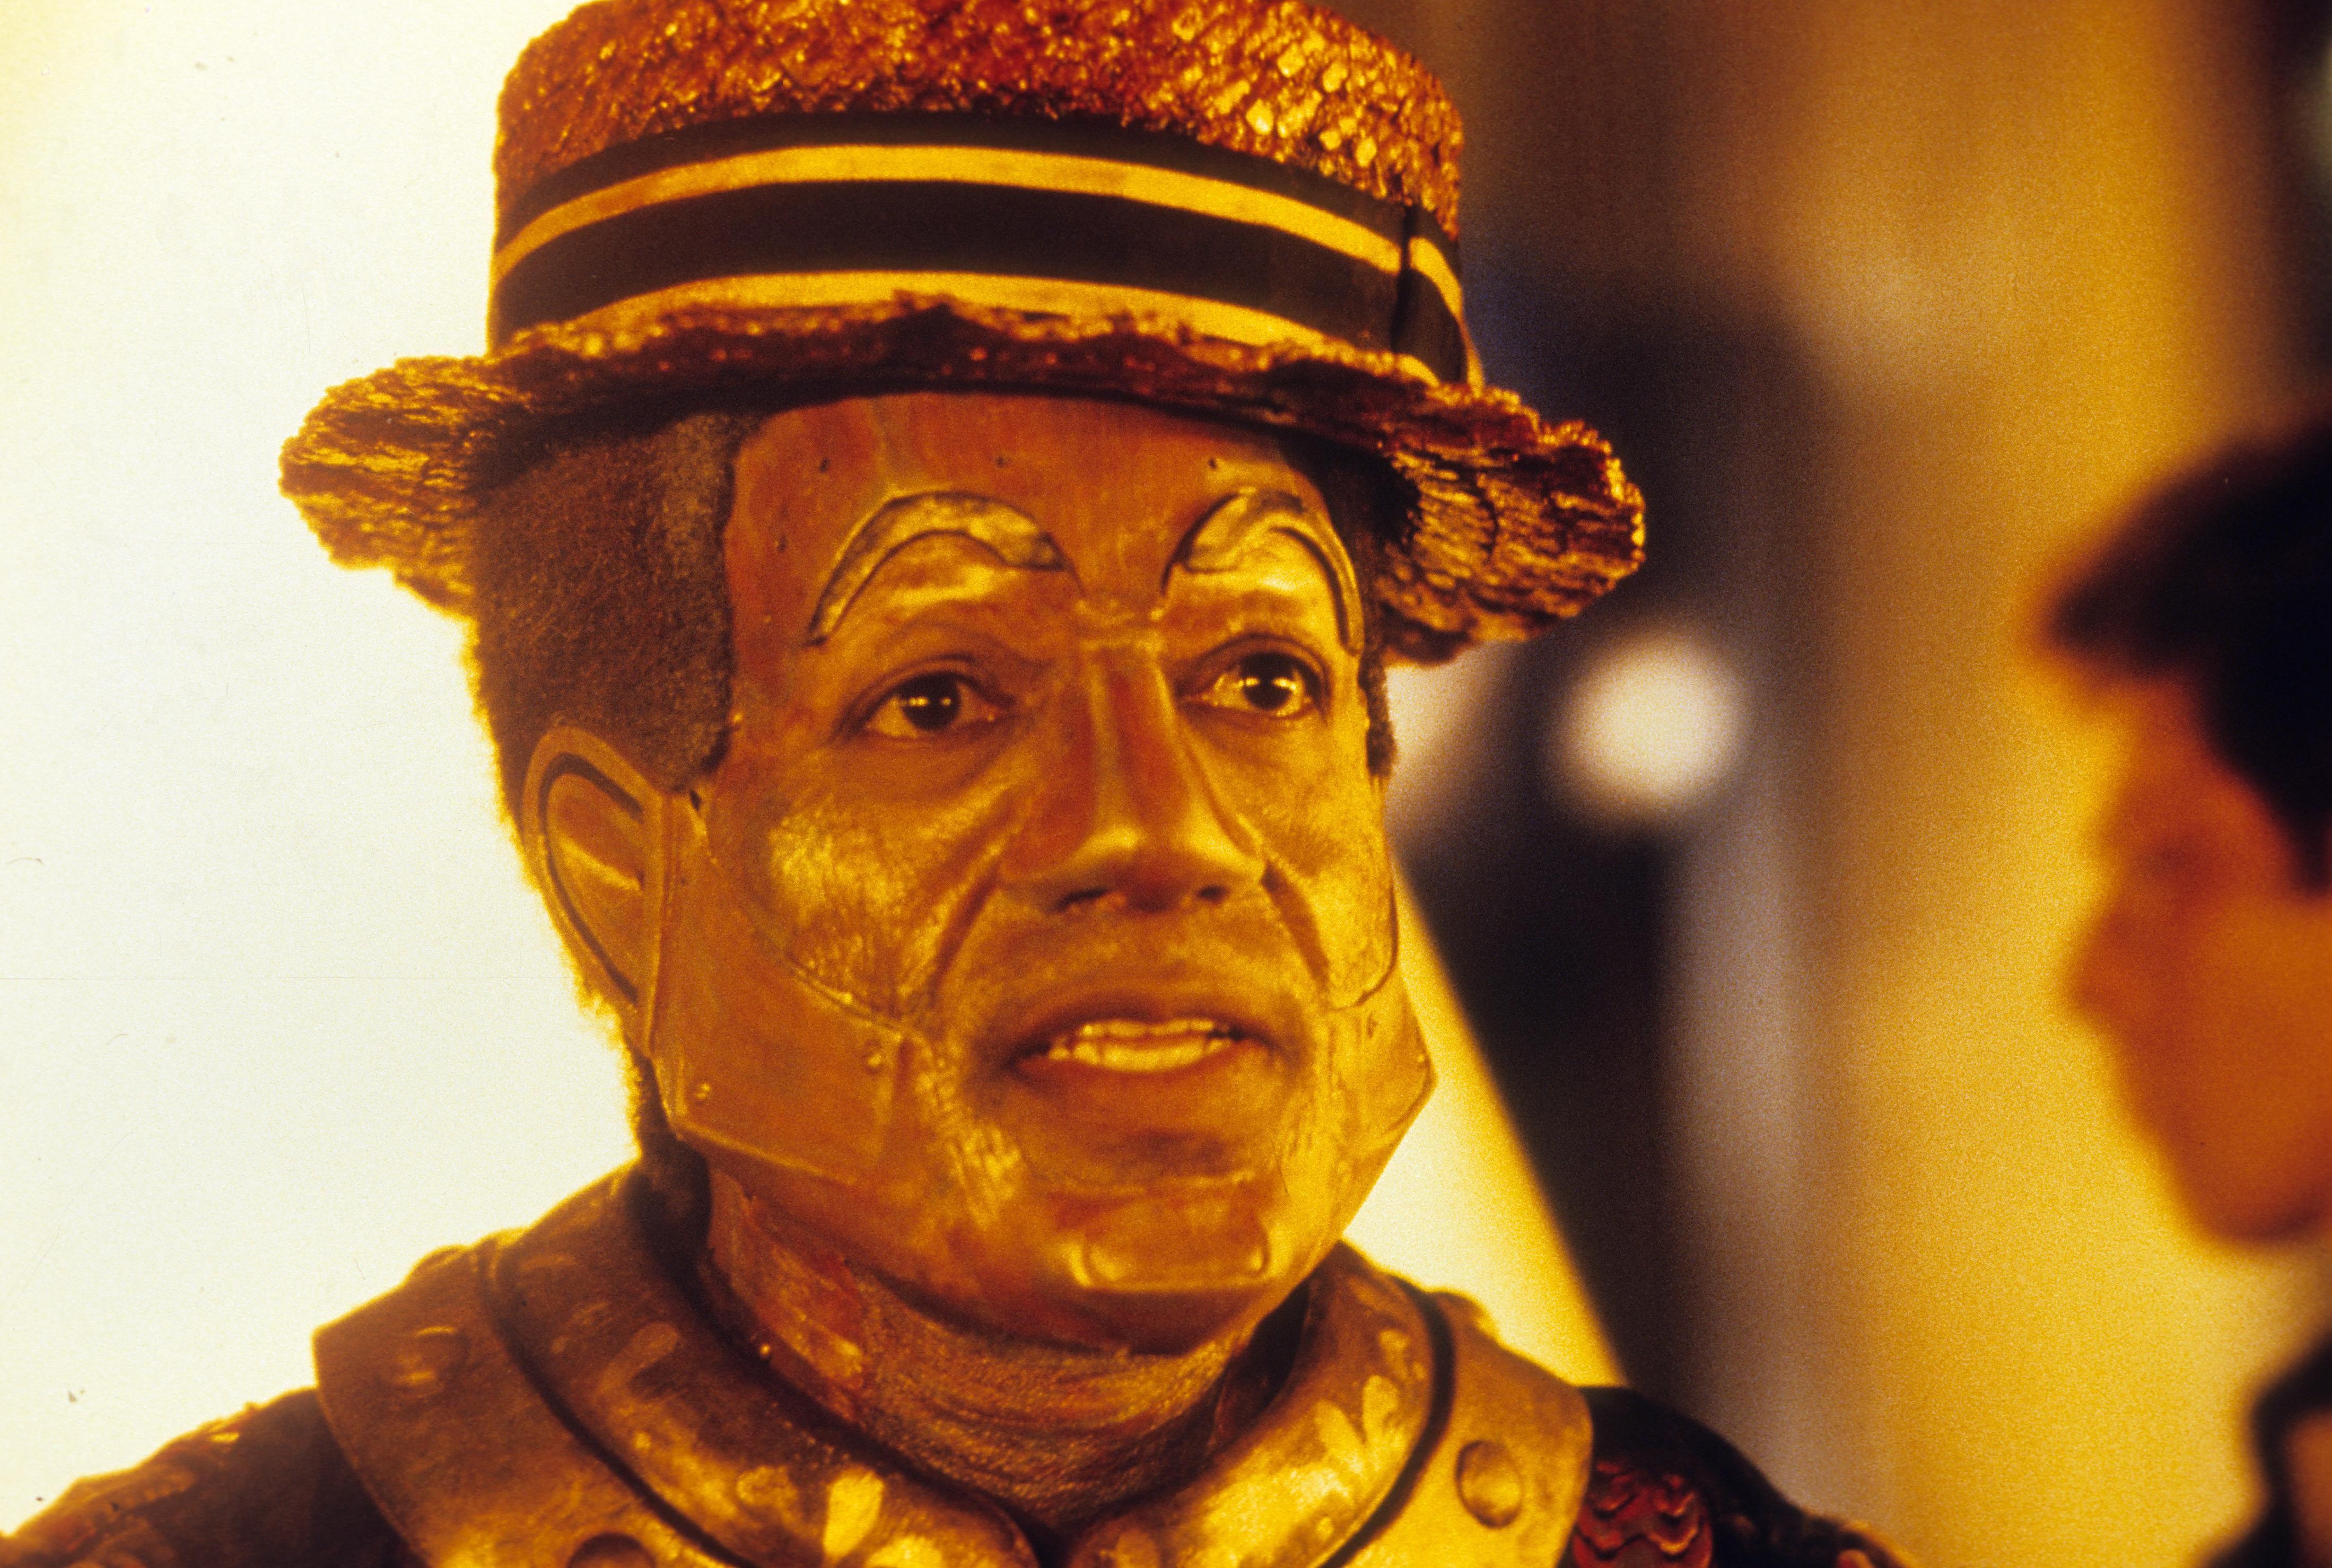 Nipsey Russell as The Tin Man Wiz (1978 & 2015